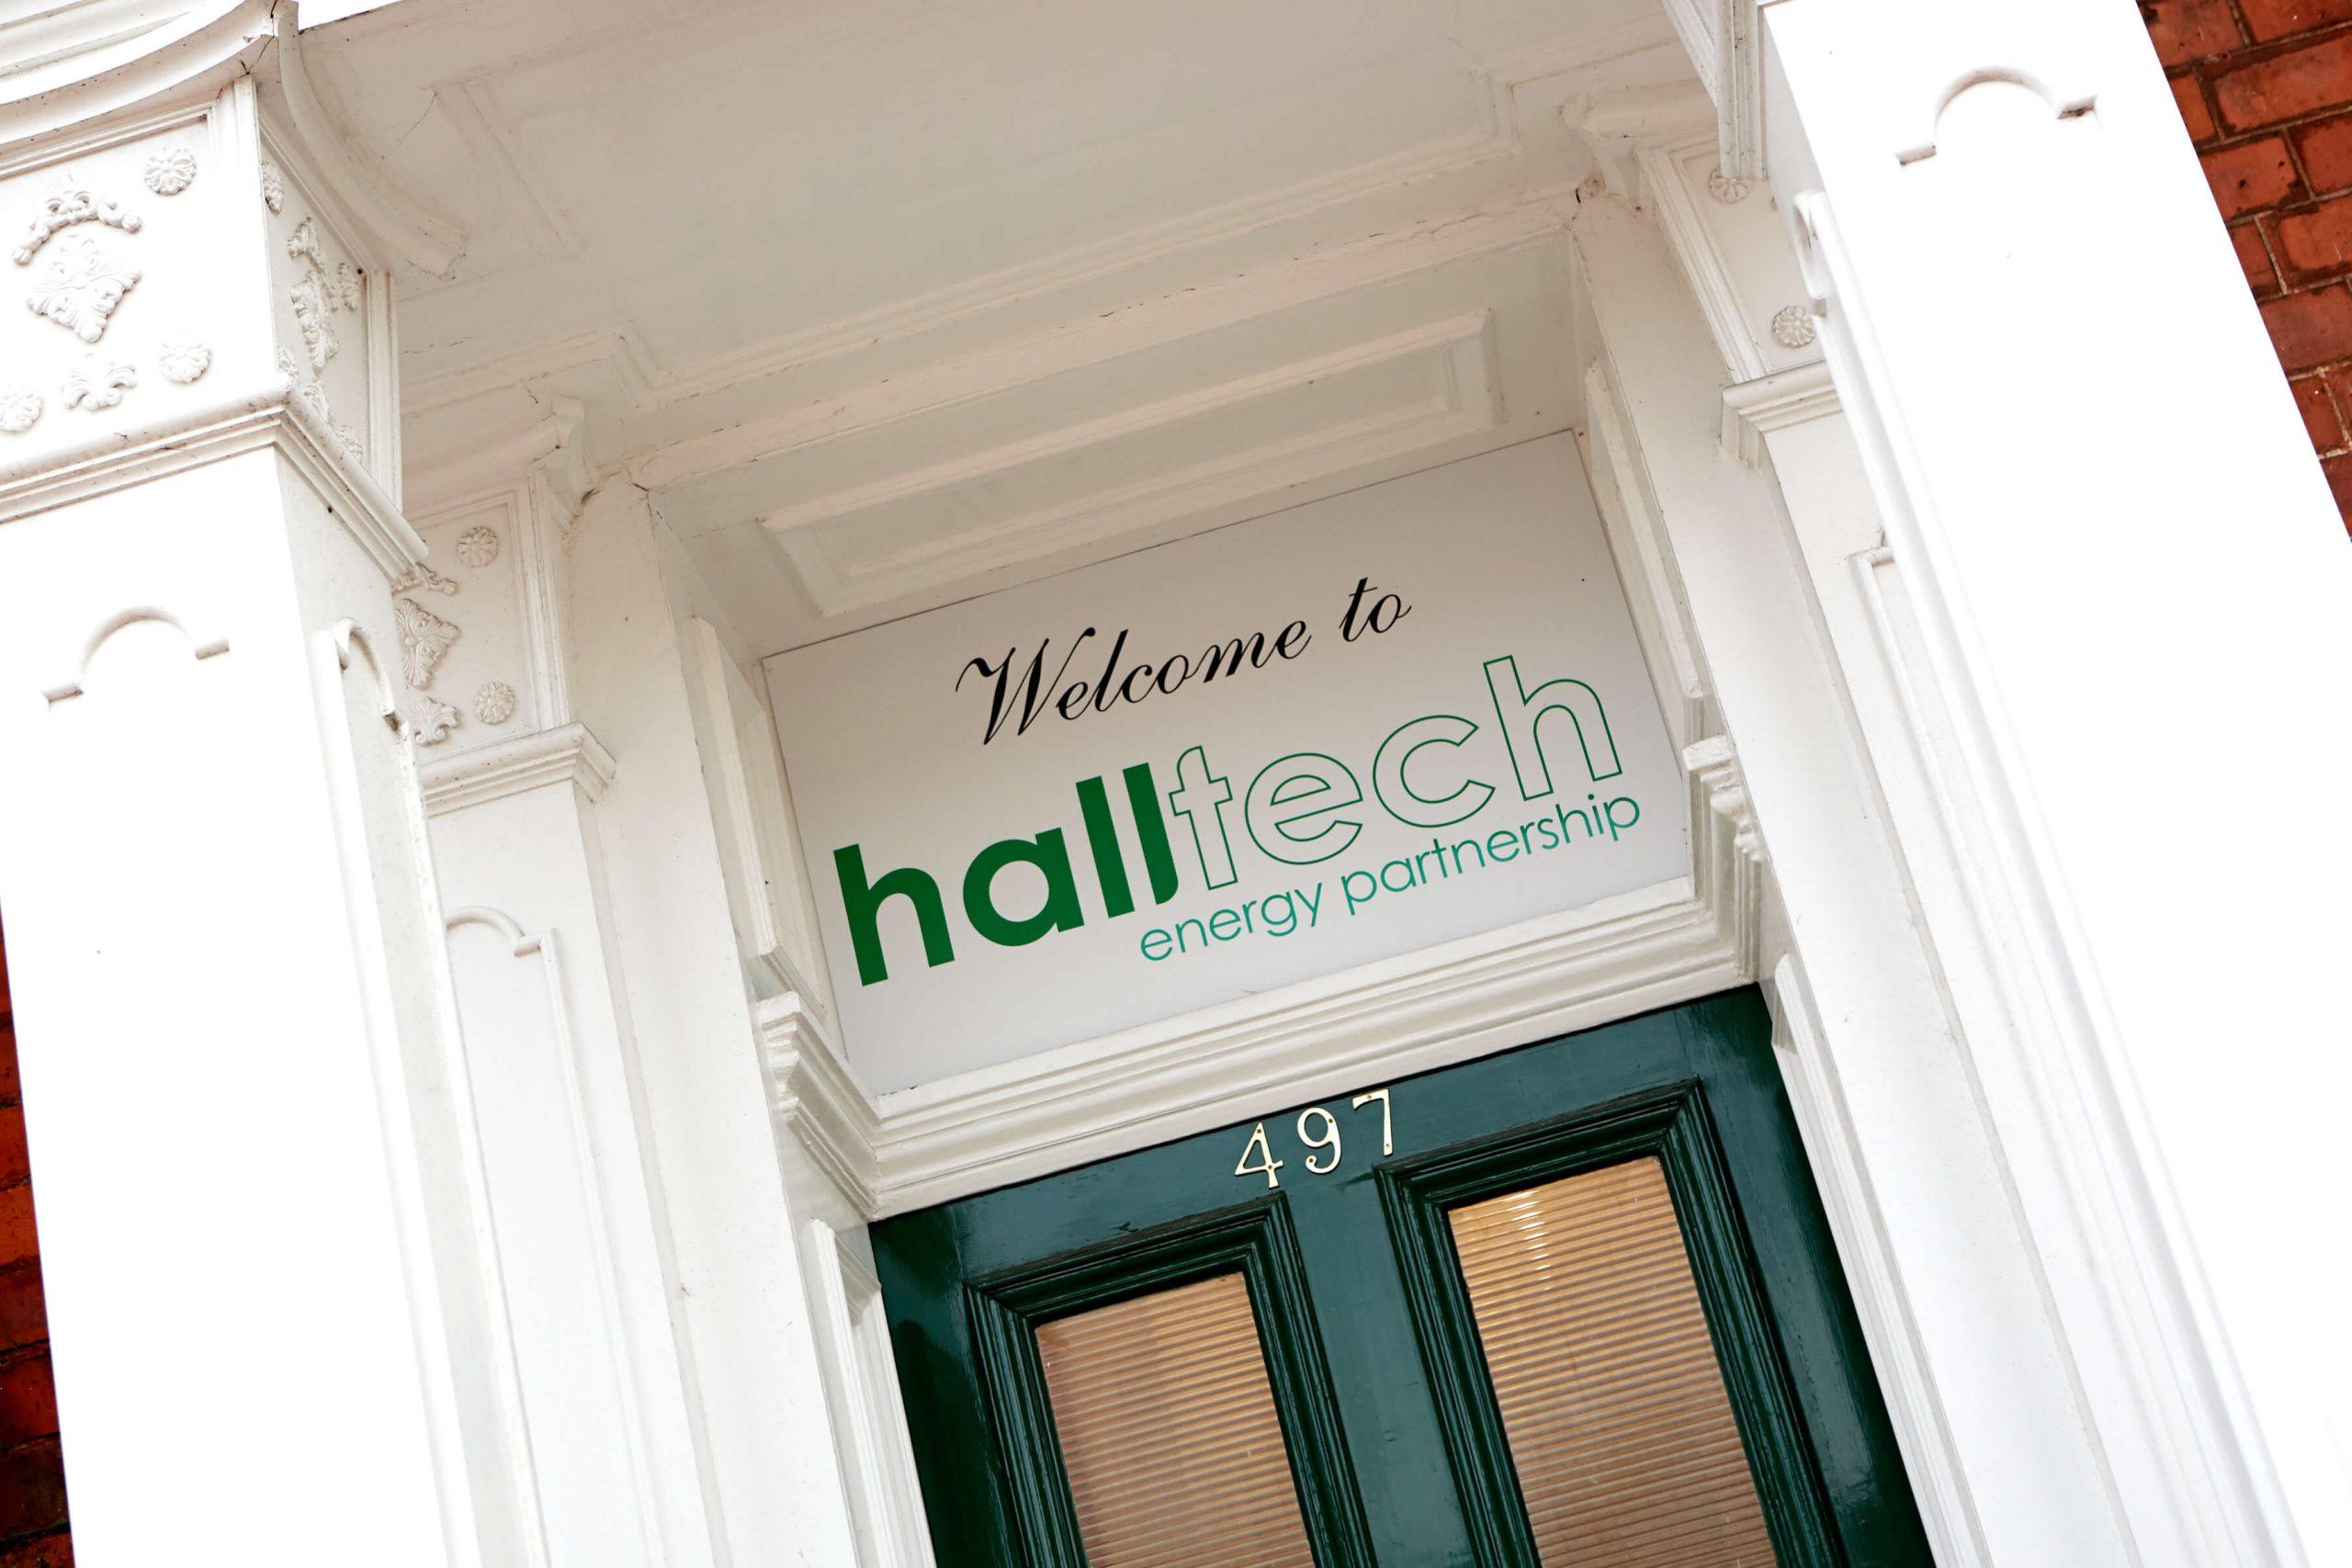 Halltech Energy Partnership